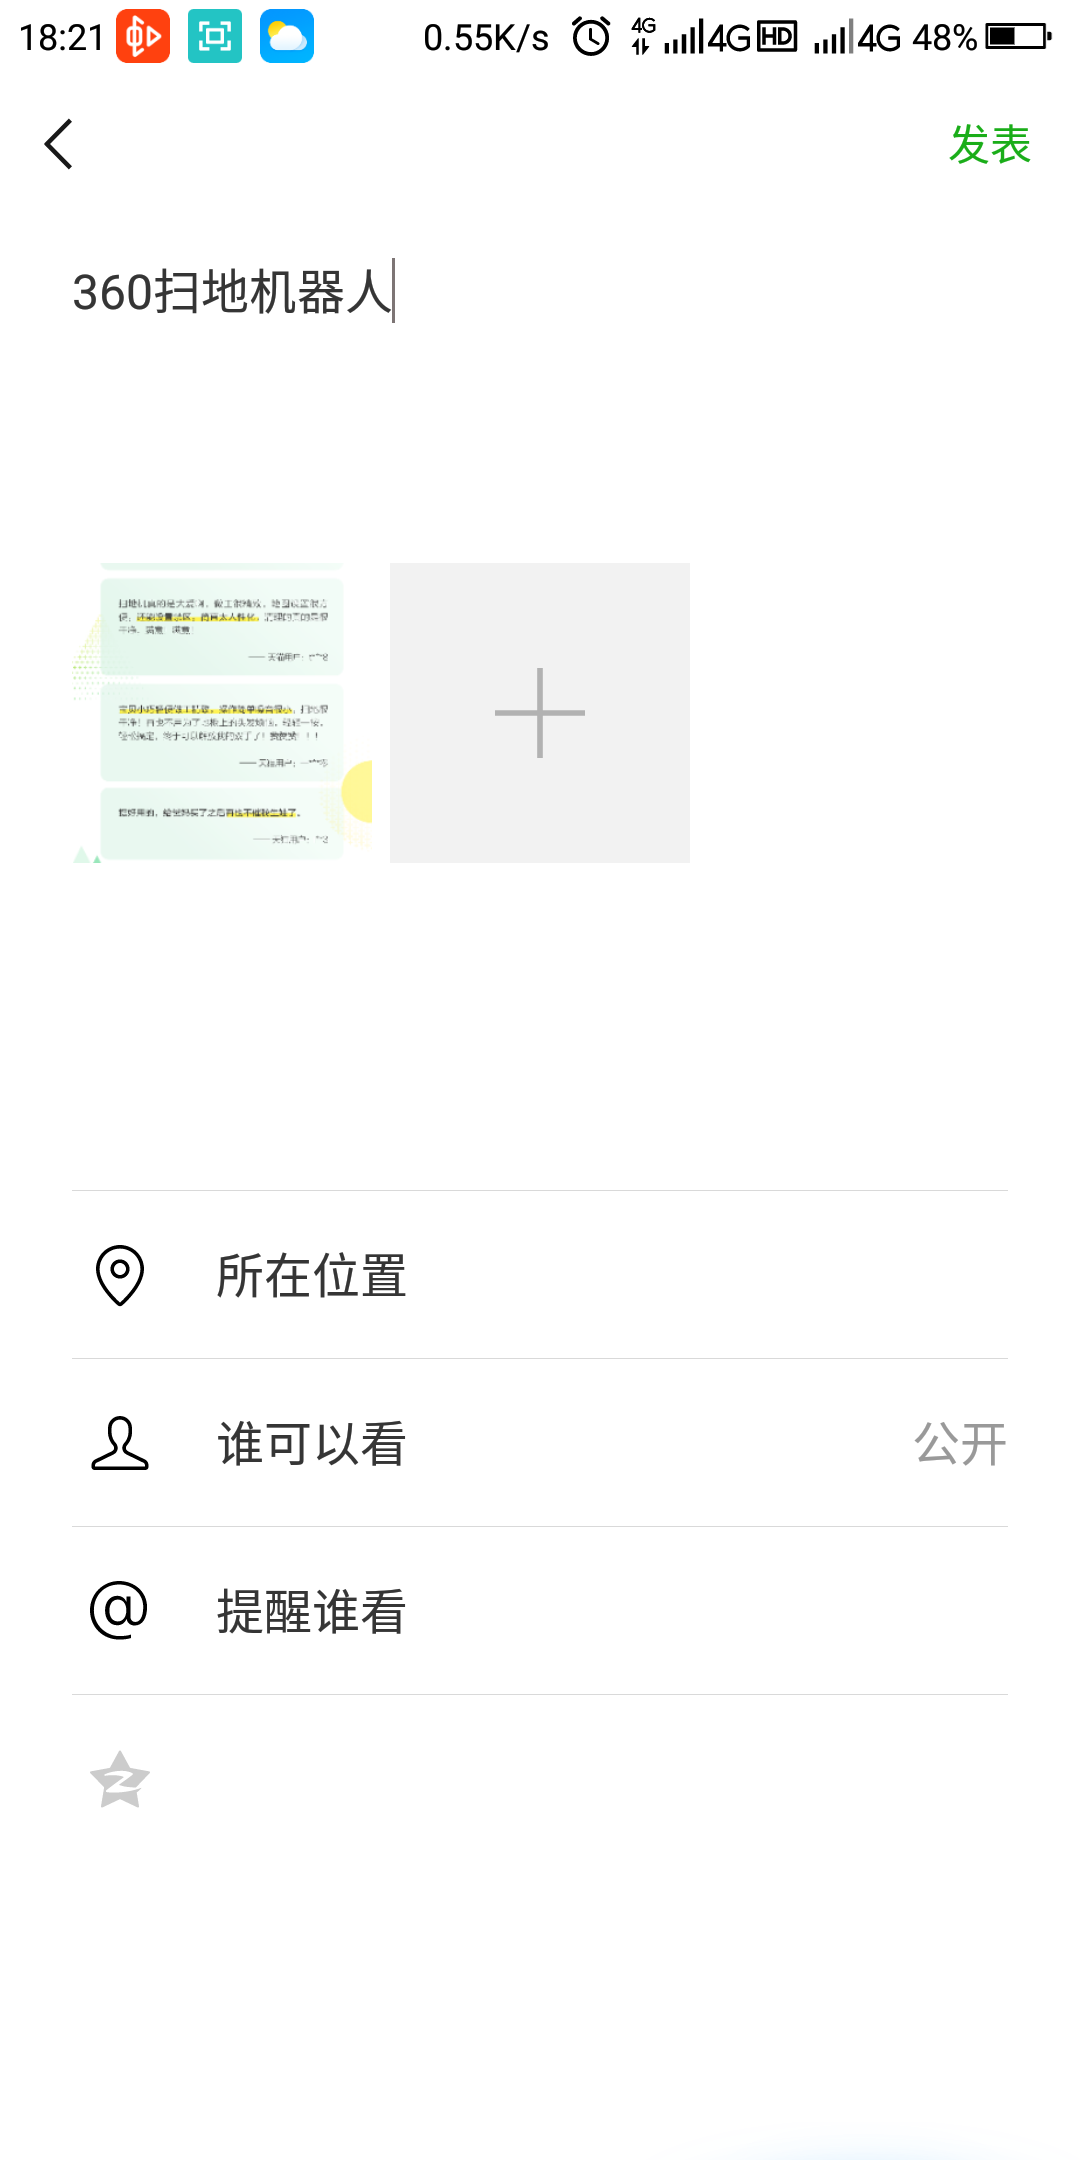 Screenshot_2018-12-27-18-21-03.png